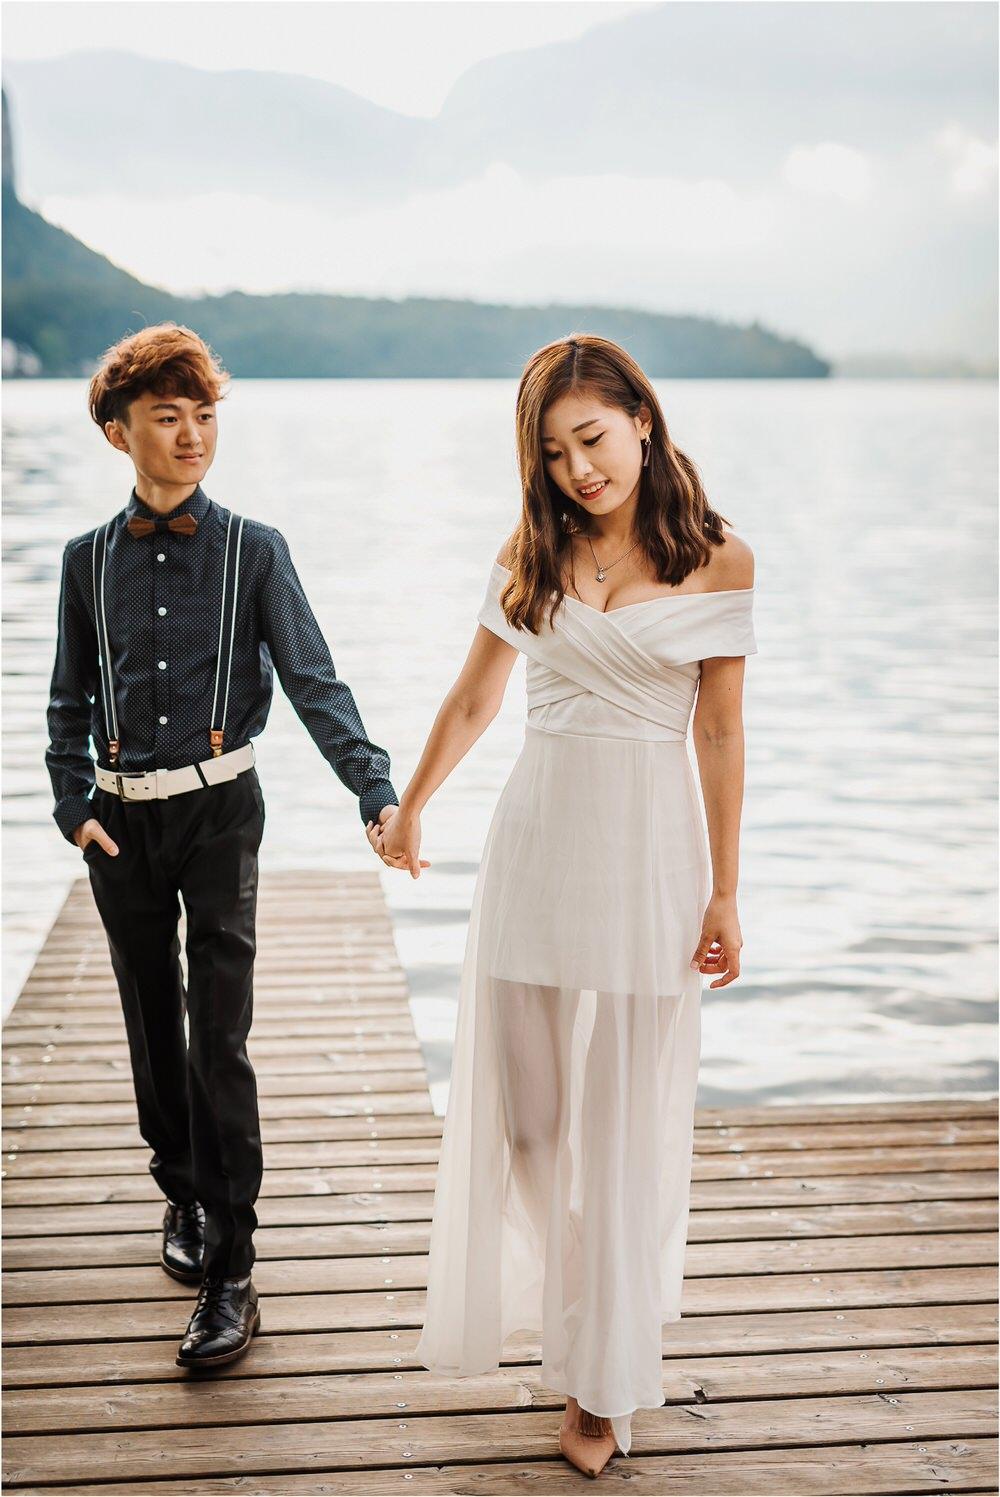 hallstatt austria wedding engagement photographer asian proposal surprise photography recommended nature professional 0027.jpg